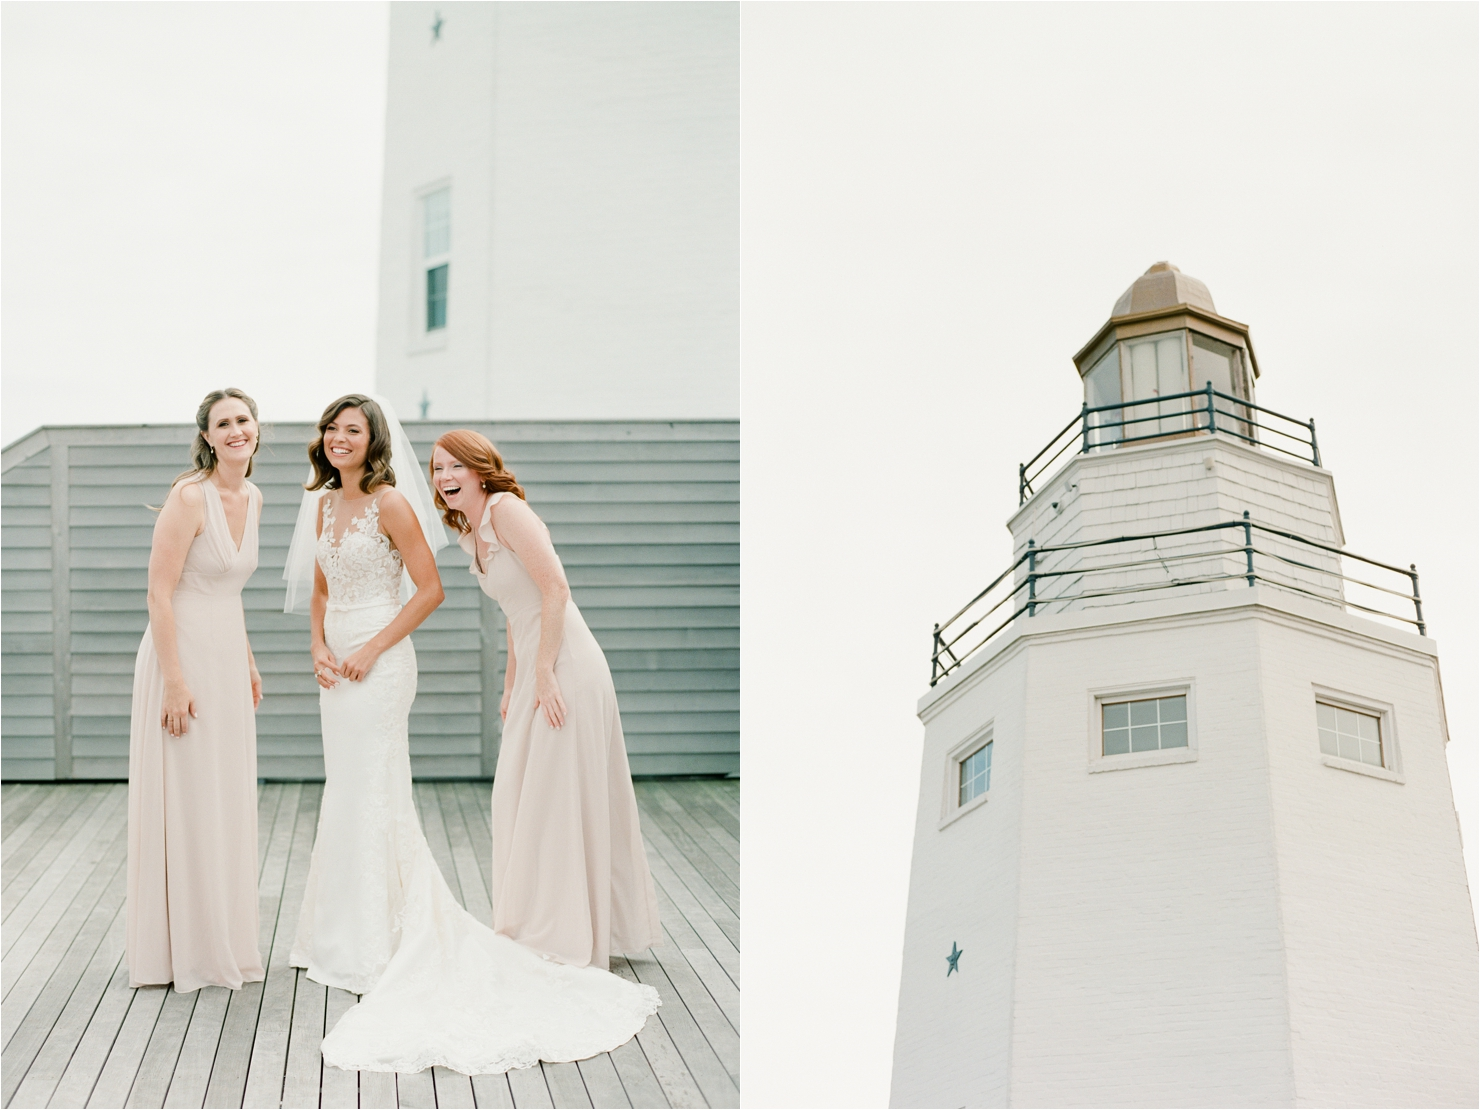 Bride and Bridesmaids Getting Ready Together Gurneys Star Island Wedding Photos